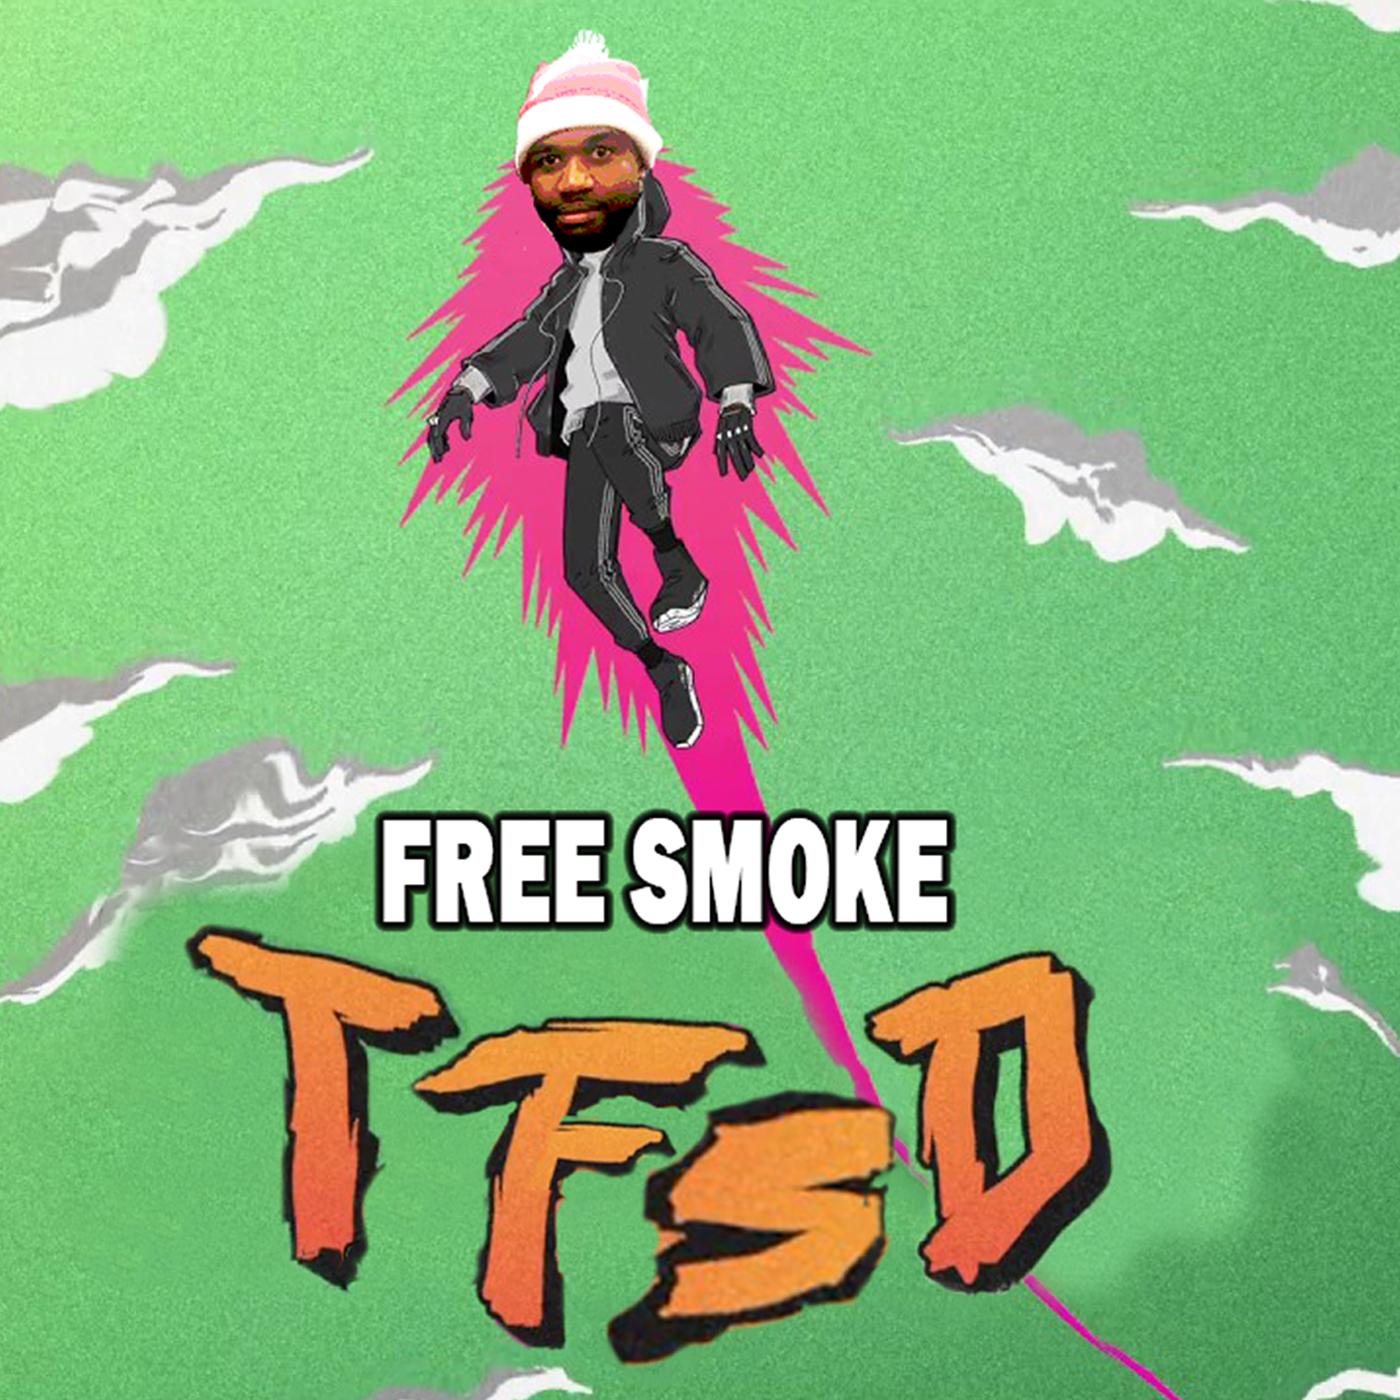 The Free Smoke Dixon PodCast